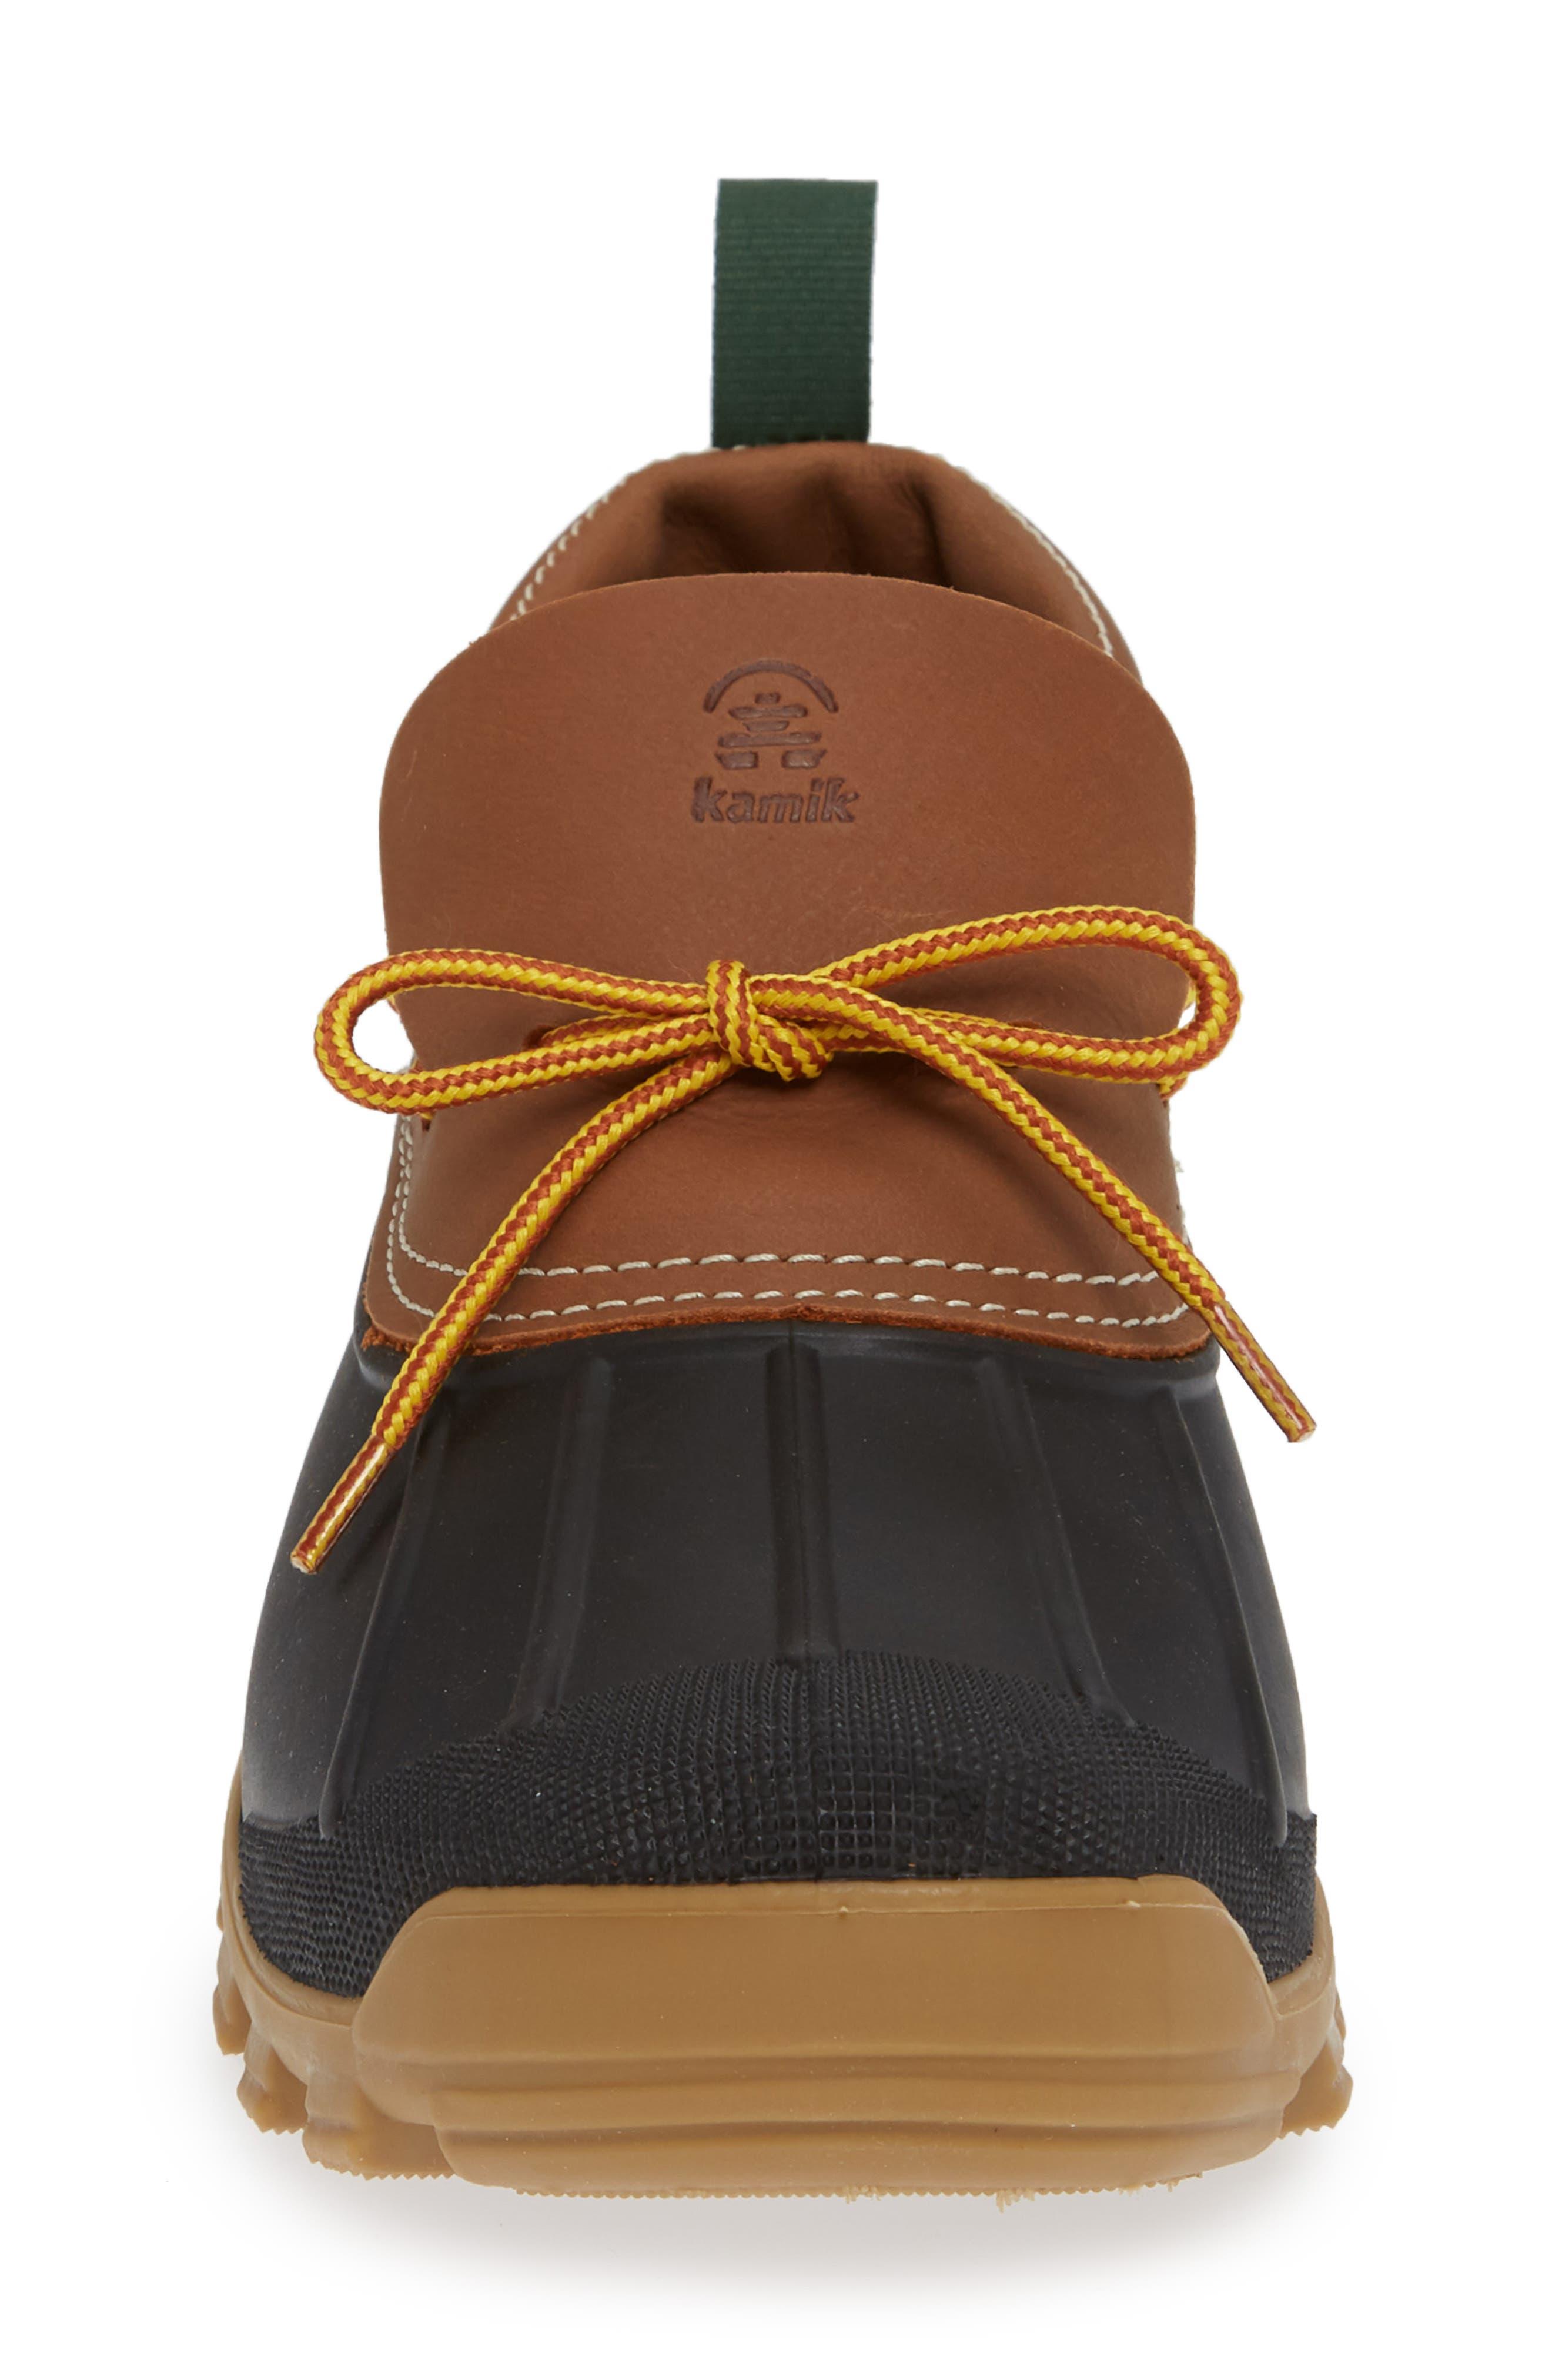 Yukon Short Waterproof Boot,                             Alternate thumbnail 4, color,                             TAN LEATHER